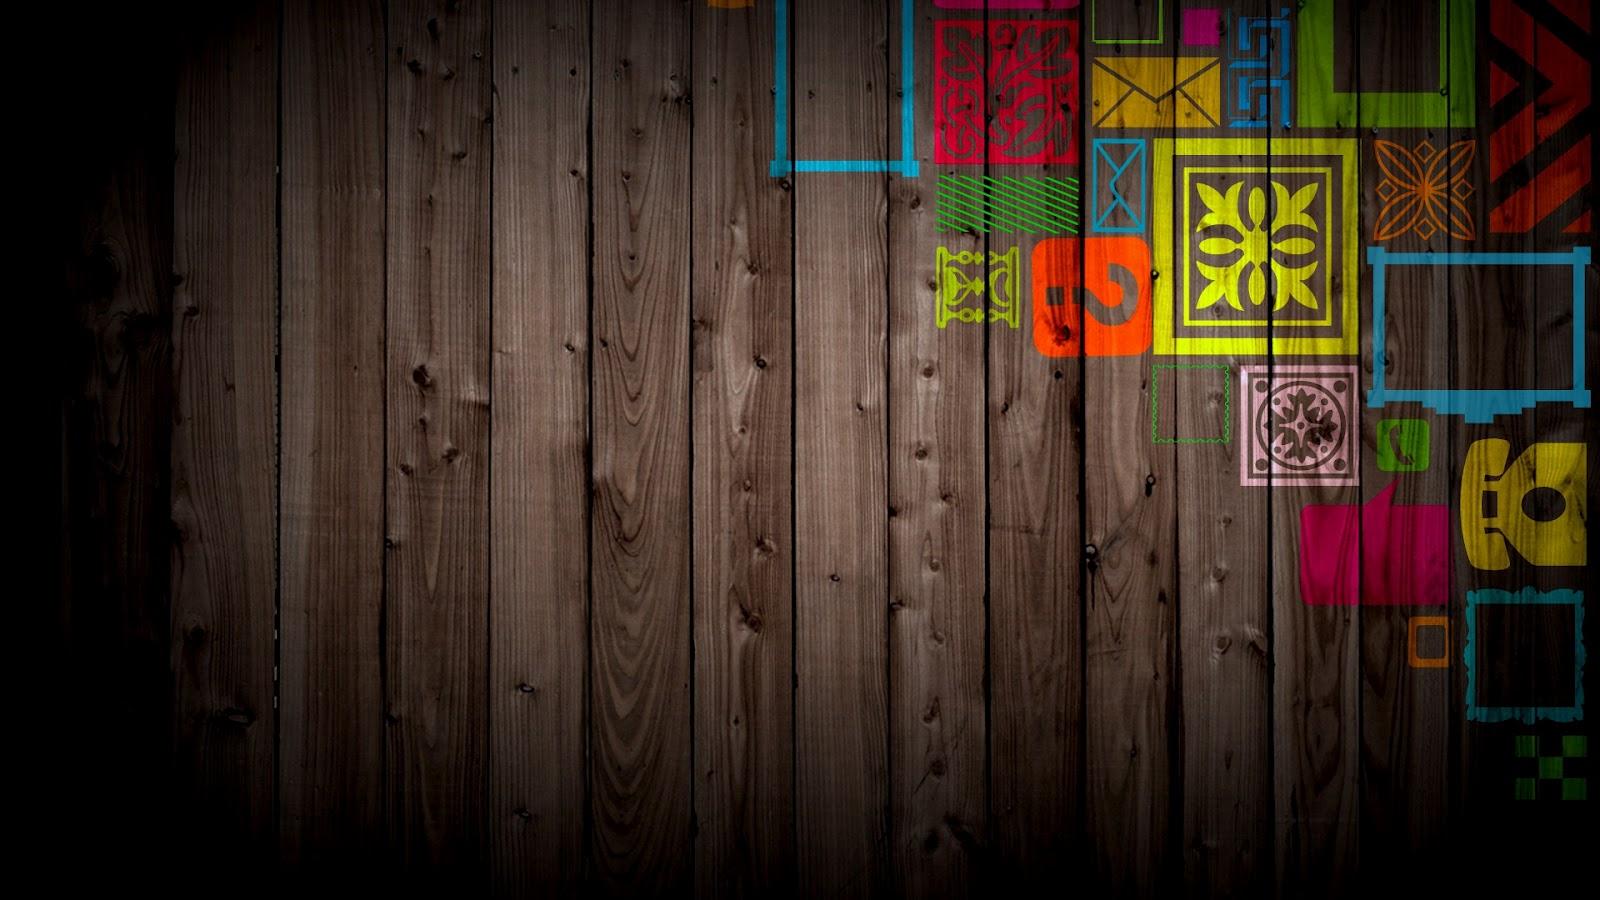 free downloads hd wallpapers: cool-wodden-wall-graffiti-1080p-hd